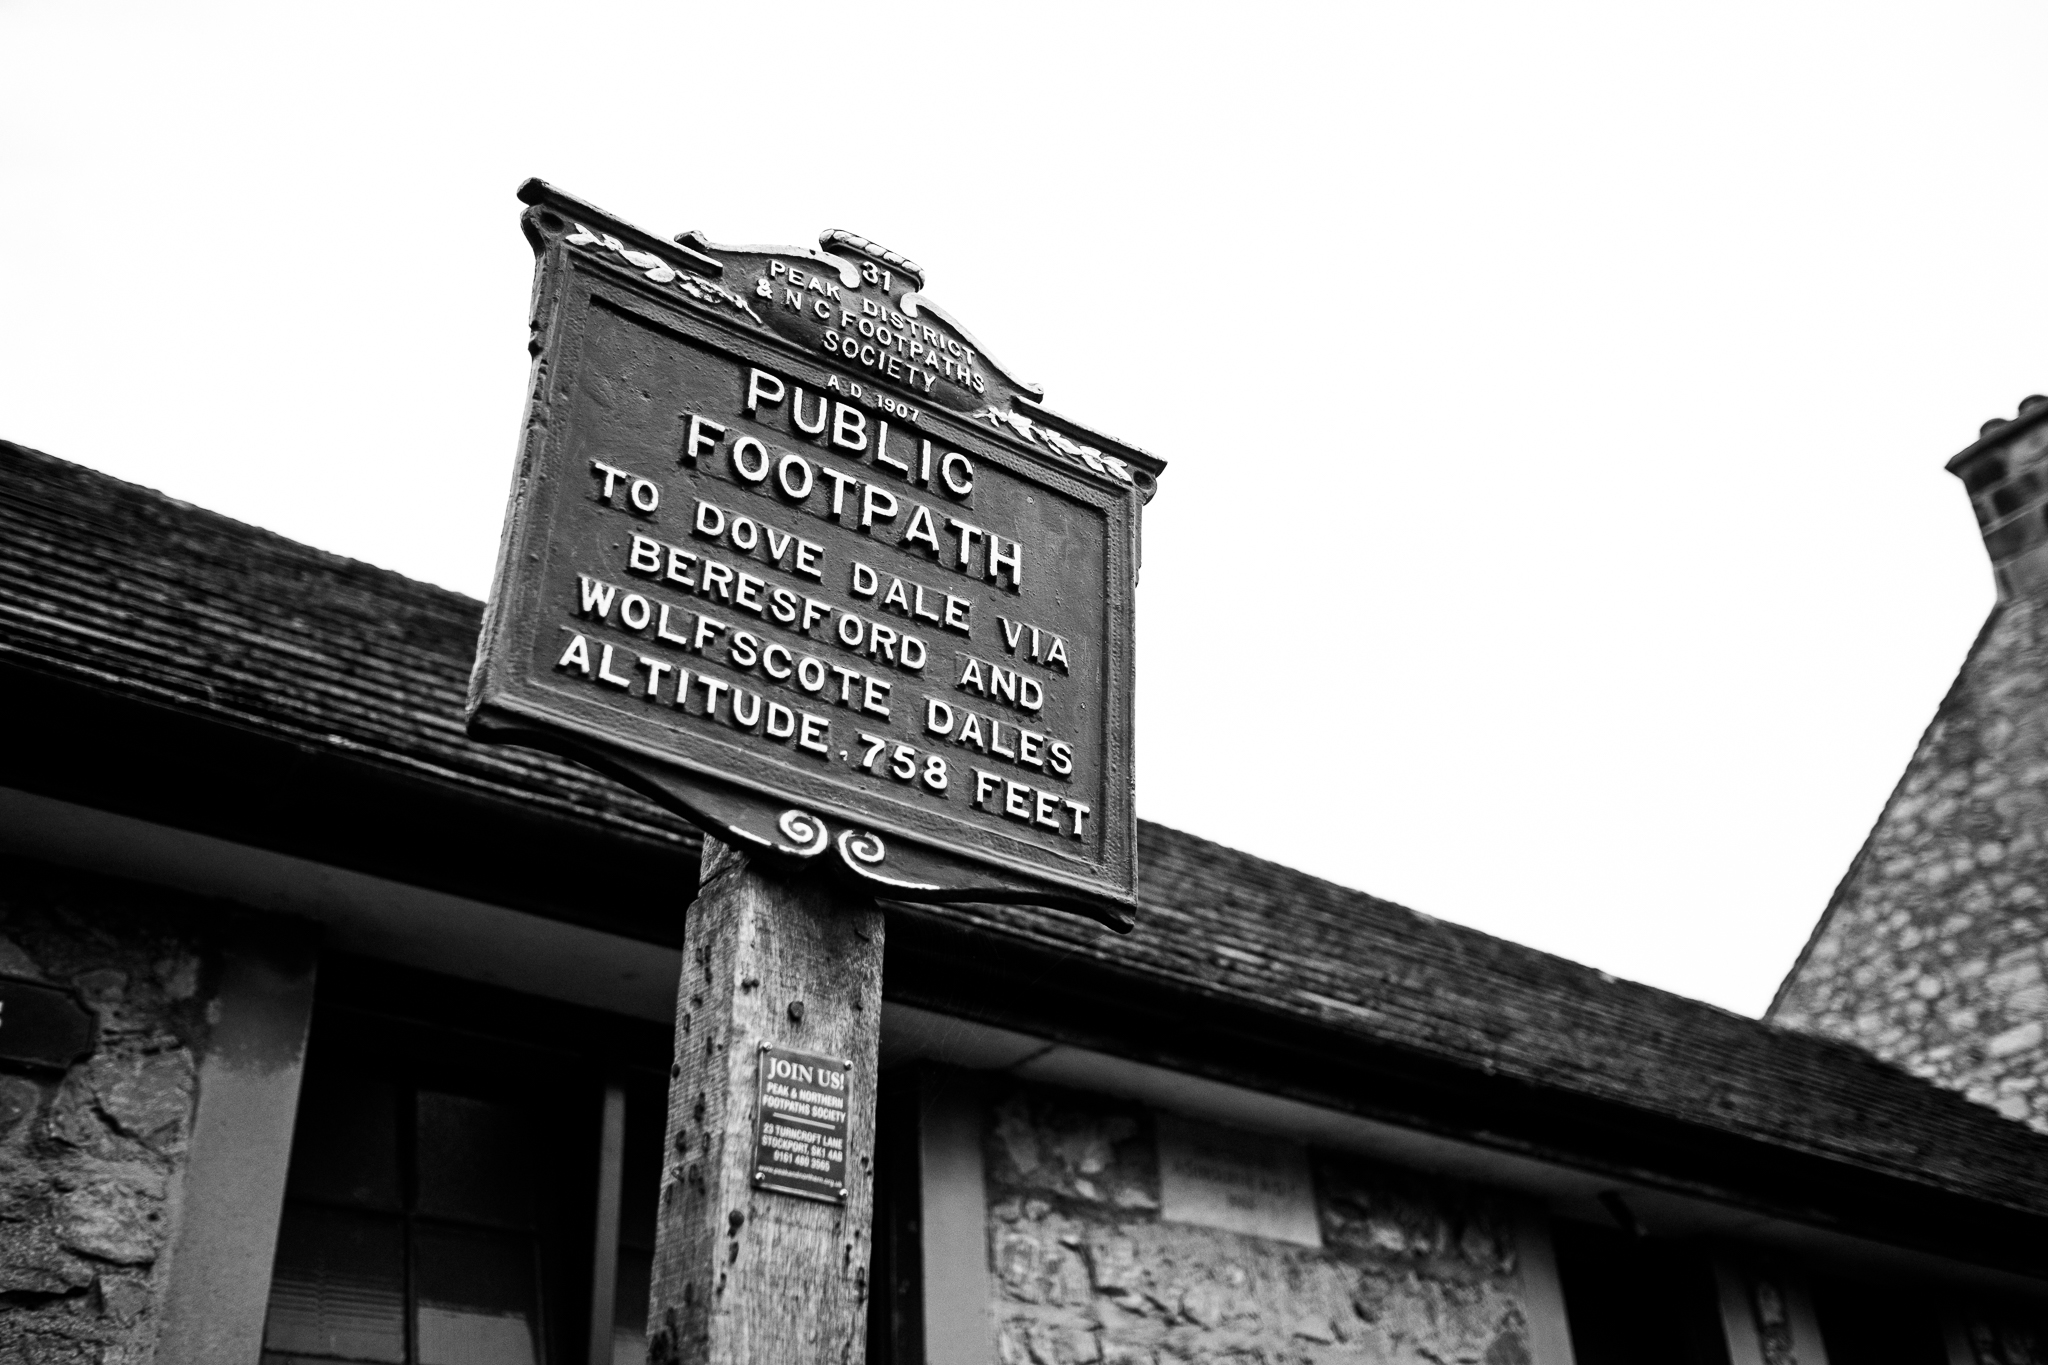 05.19.2017 The Photowalk Network Get Some Fresh Air Photowalk at Hartington and Biggin, Staffordshire Peak District National Trust-1.jpg